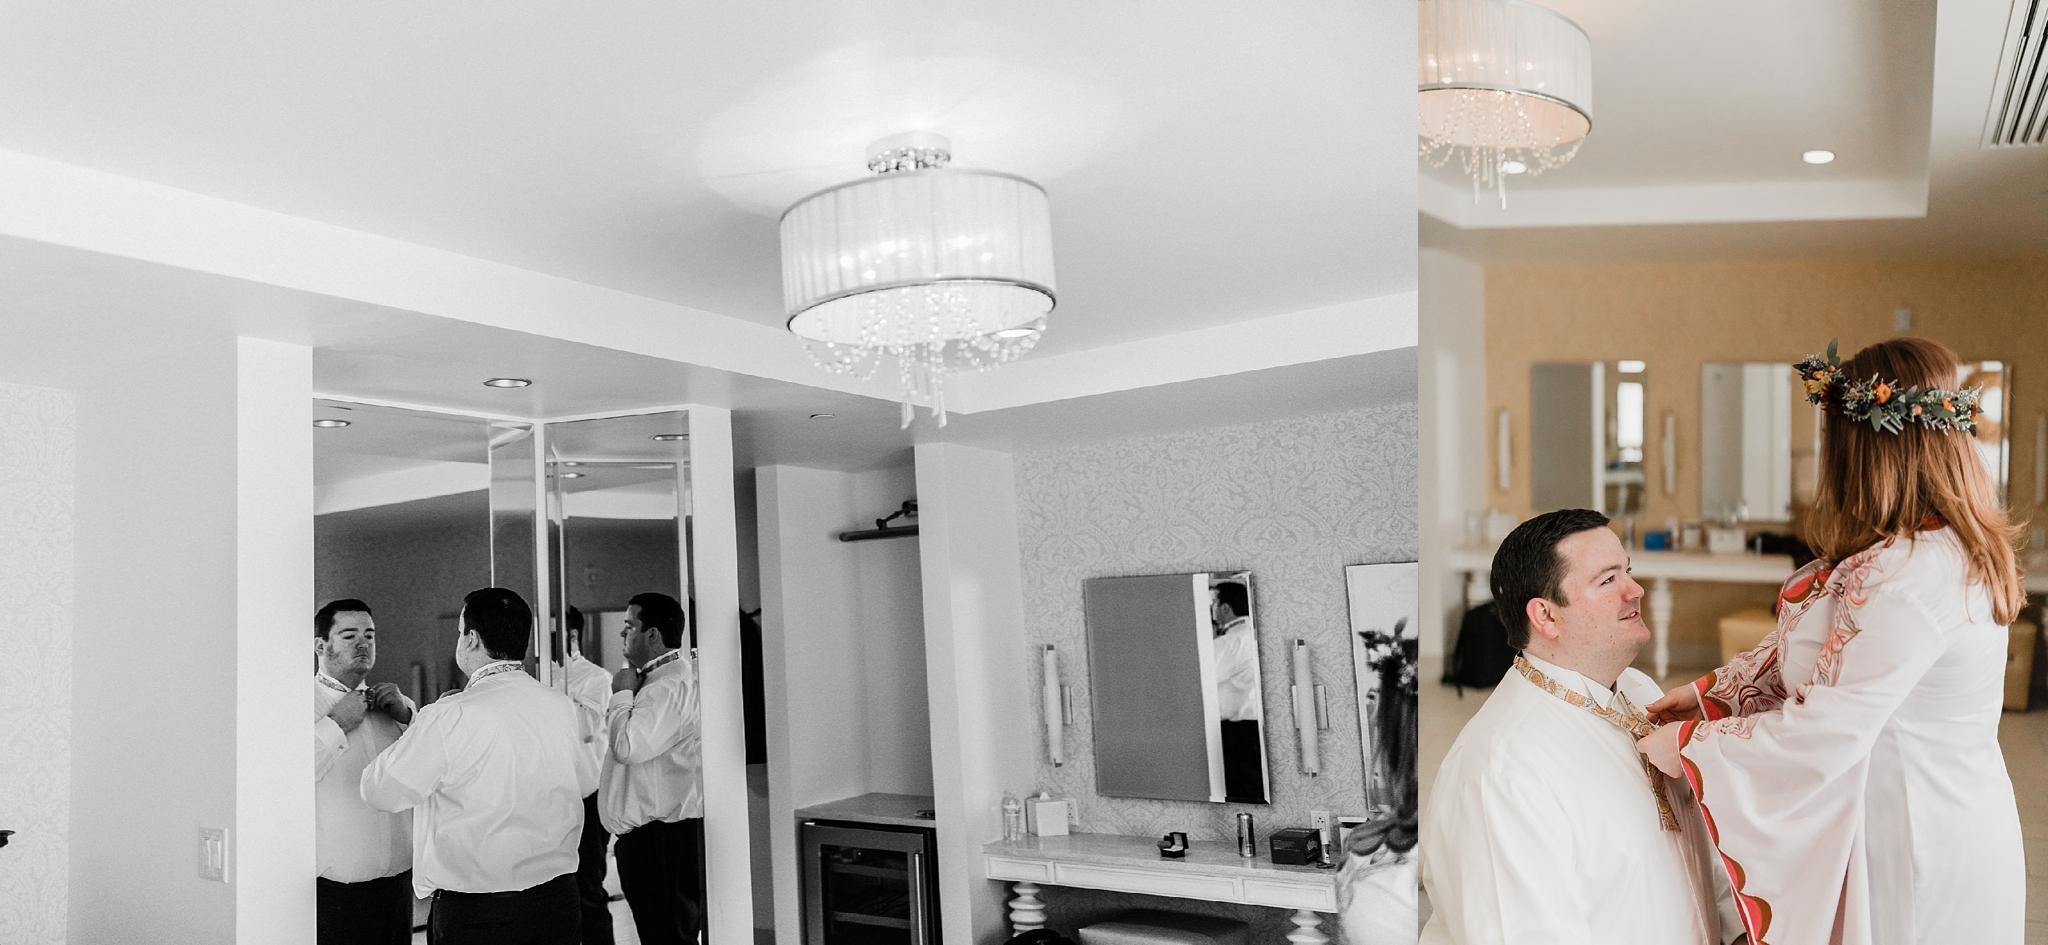 Alicia+lucia+photography+-+albuquerque+wedding+photographer+-+santa+fe+wedding+photography+-+new+mexico+wedding+photographer+-+new+mexico+wedding+-+wedding+-+groom+-+groom+style+-+wedding+style_0062.jpg